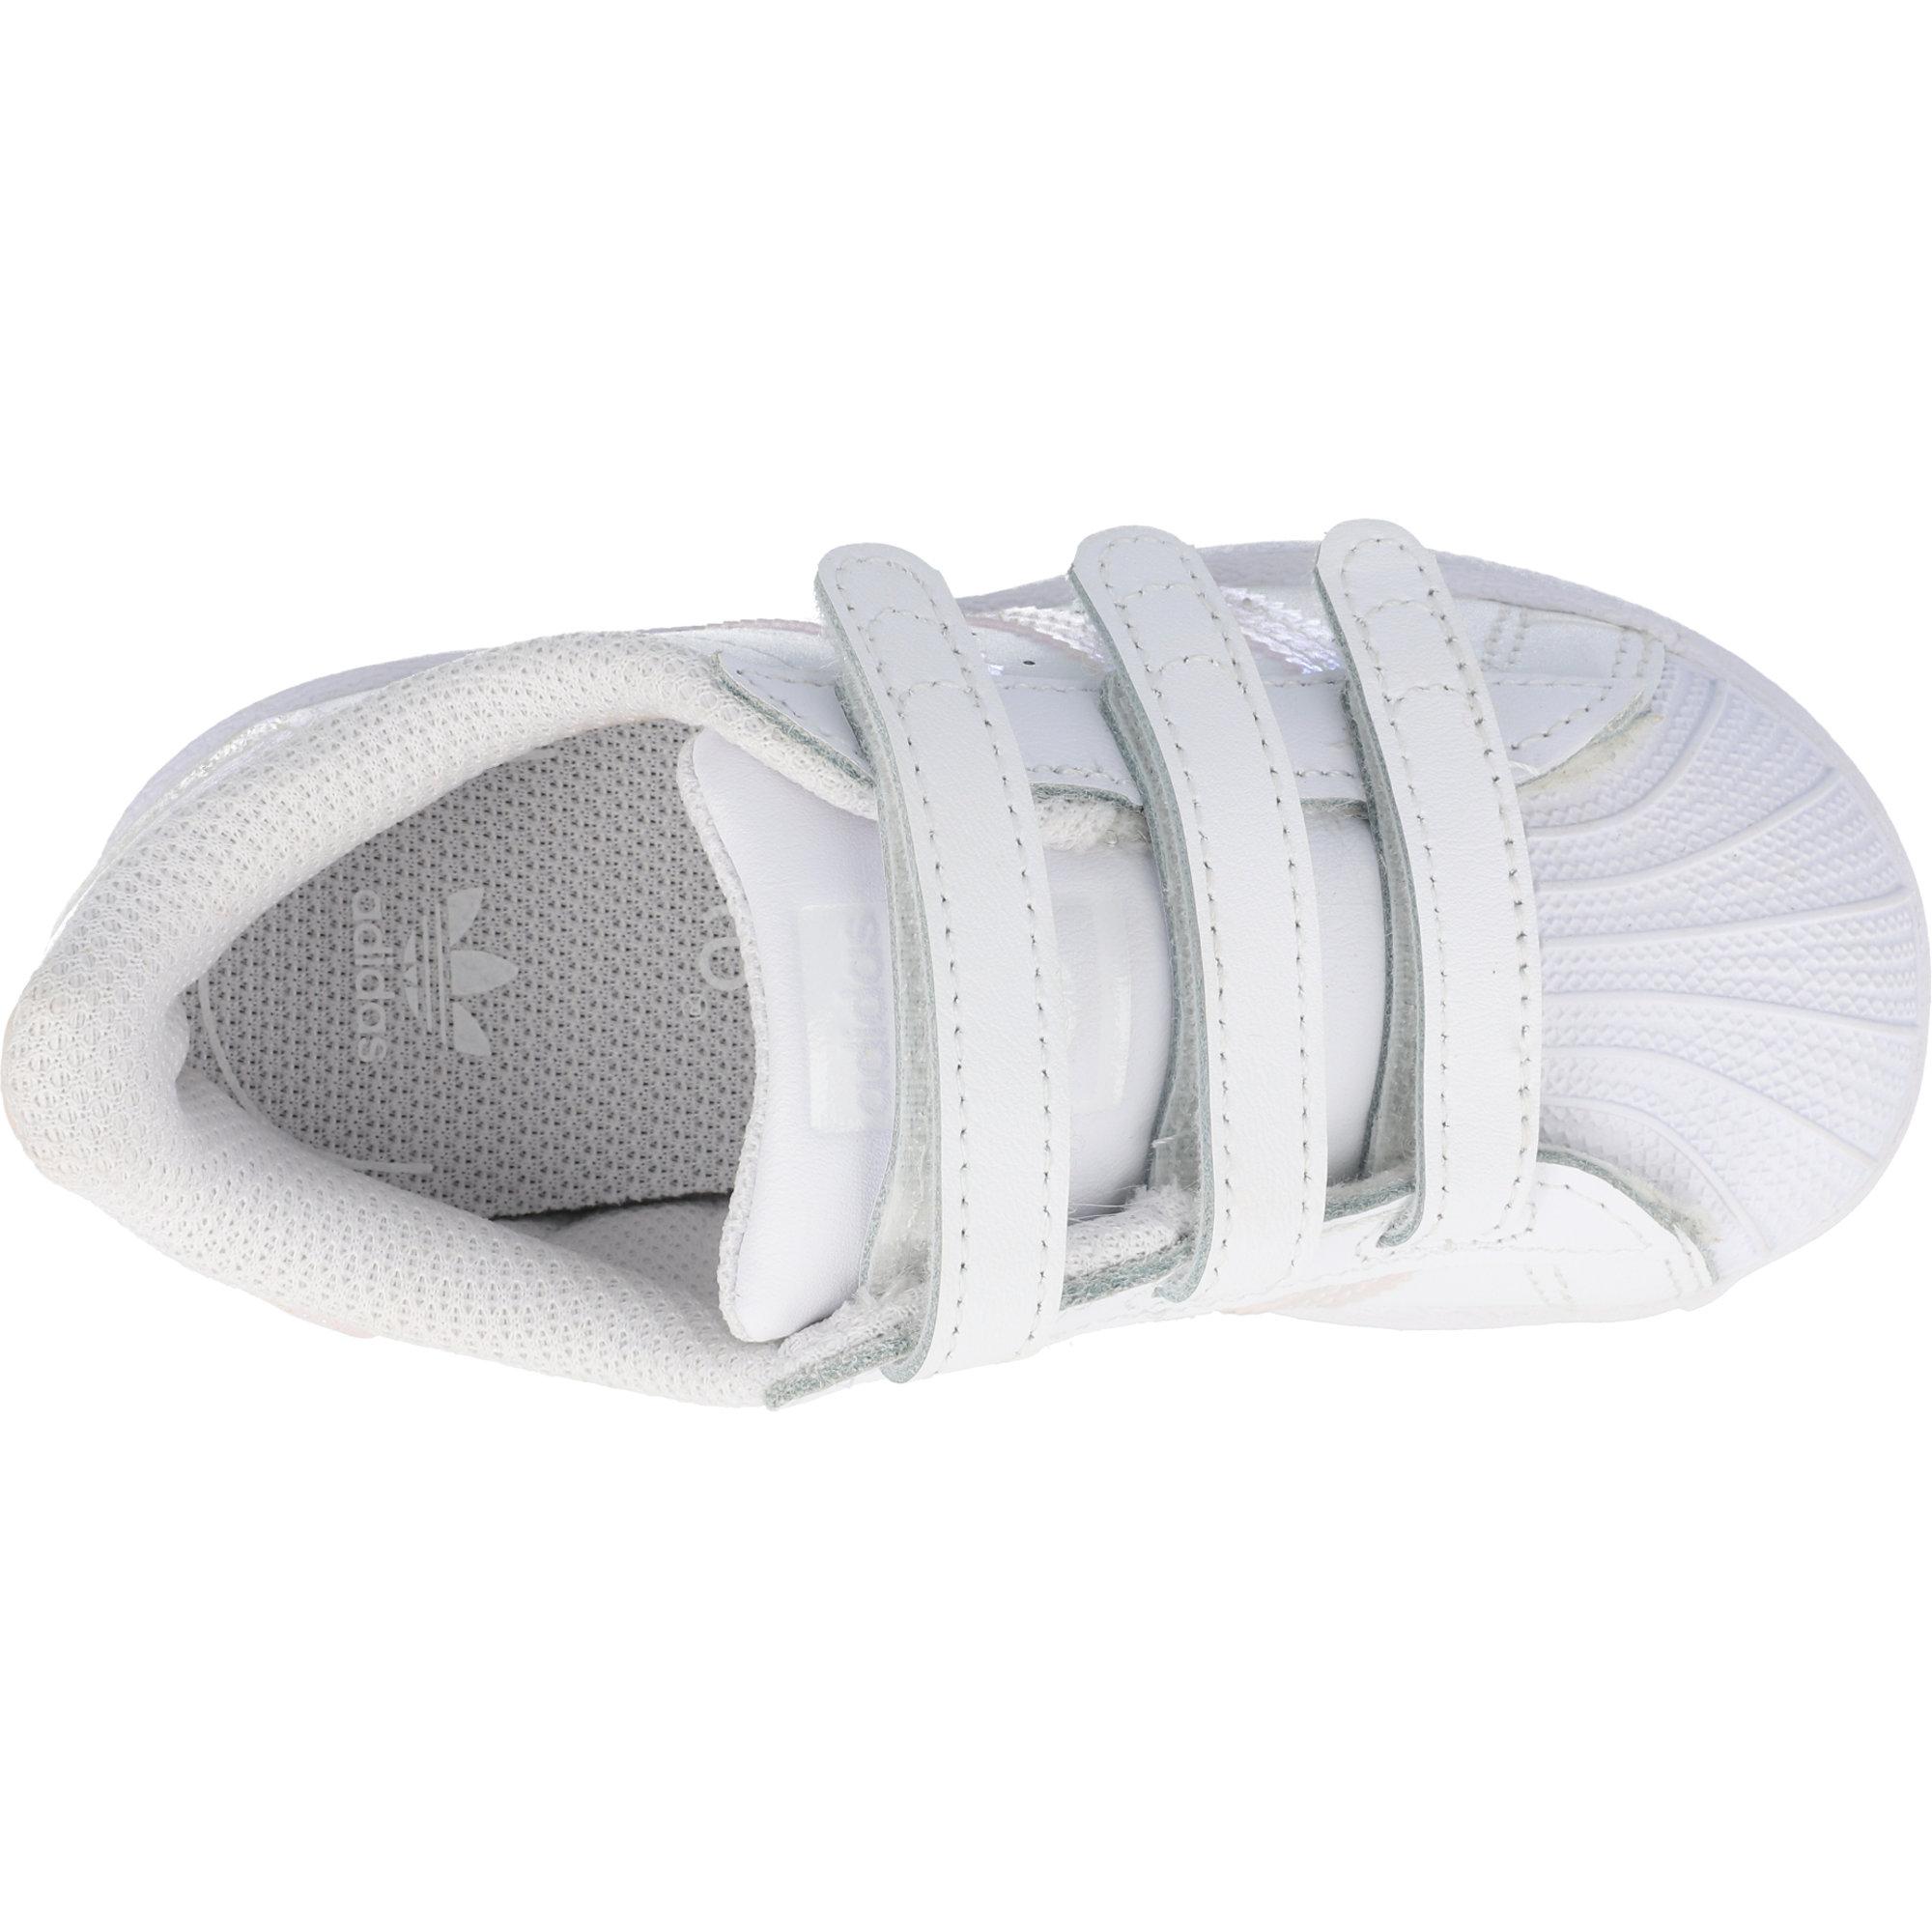 adidas Originals Superstar CF White Leather